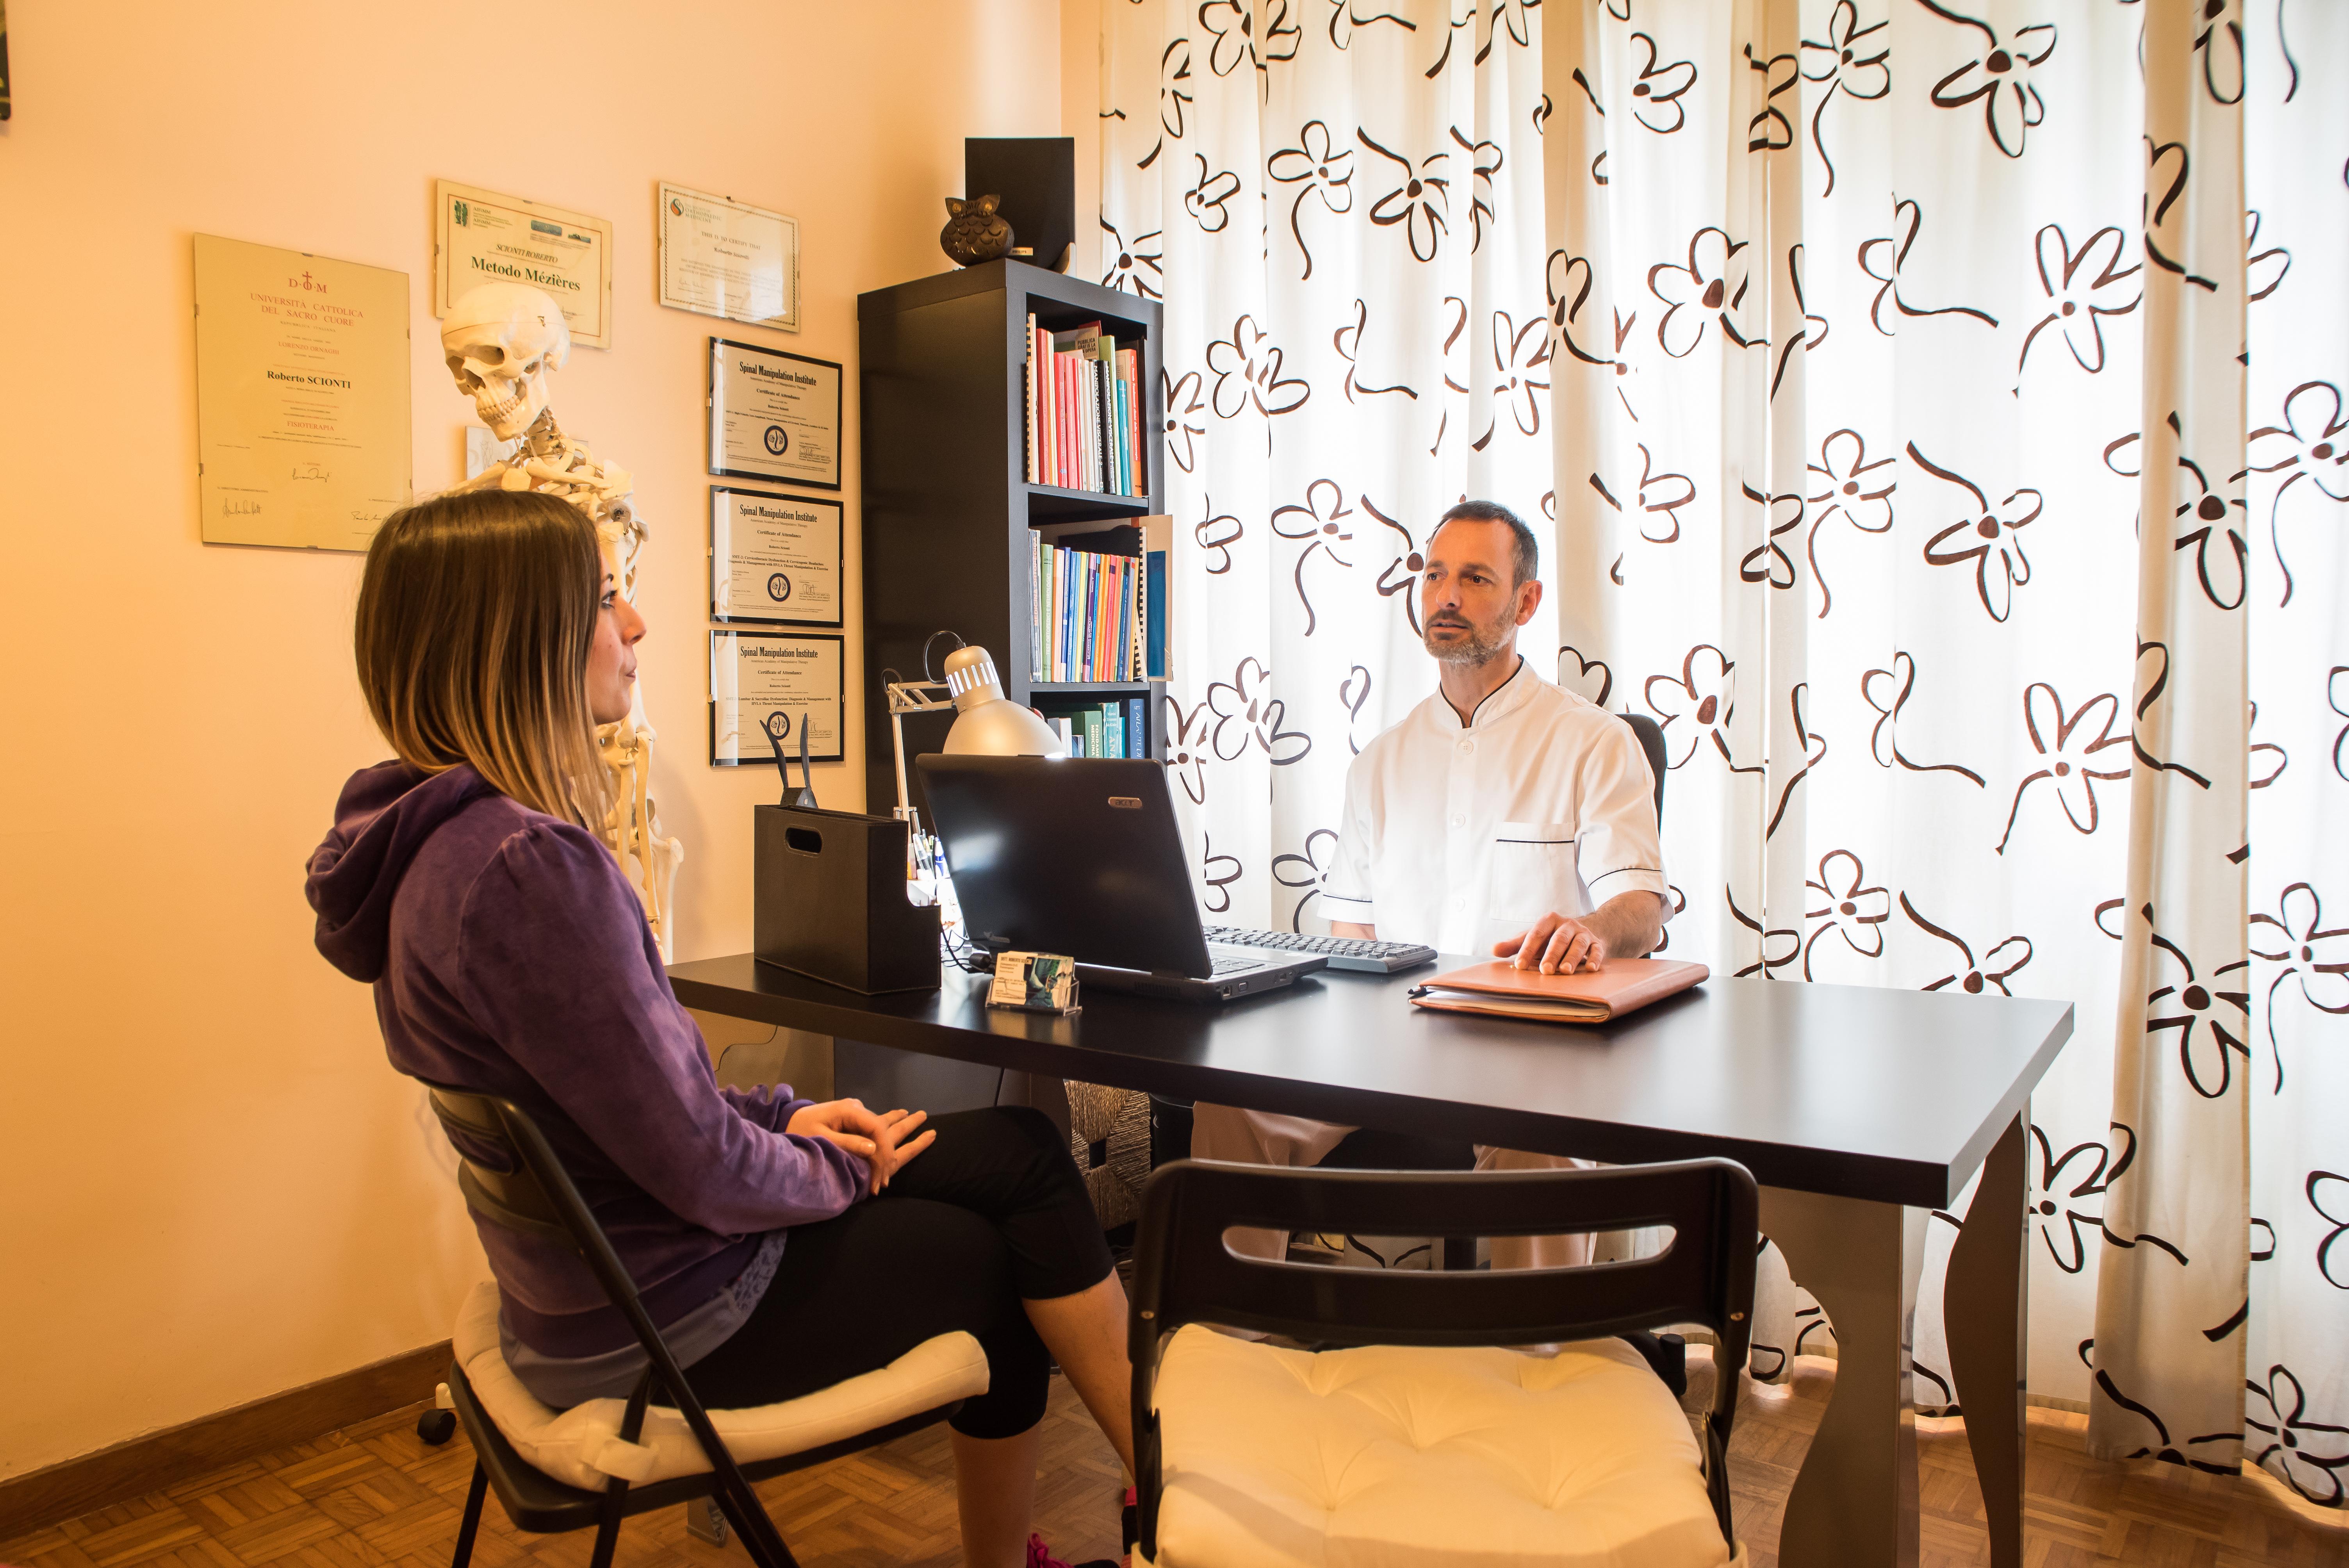 Seduta Osteopatica - Anamnesi del paziente